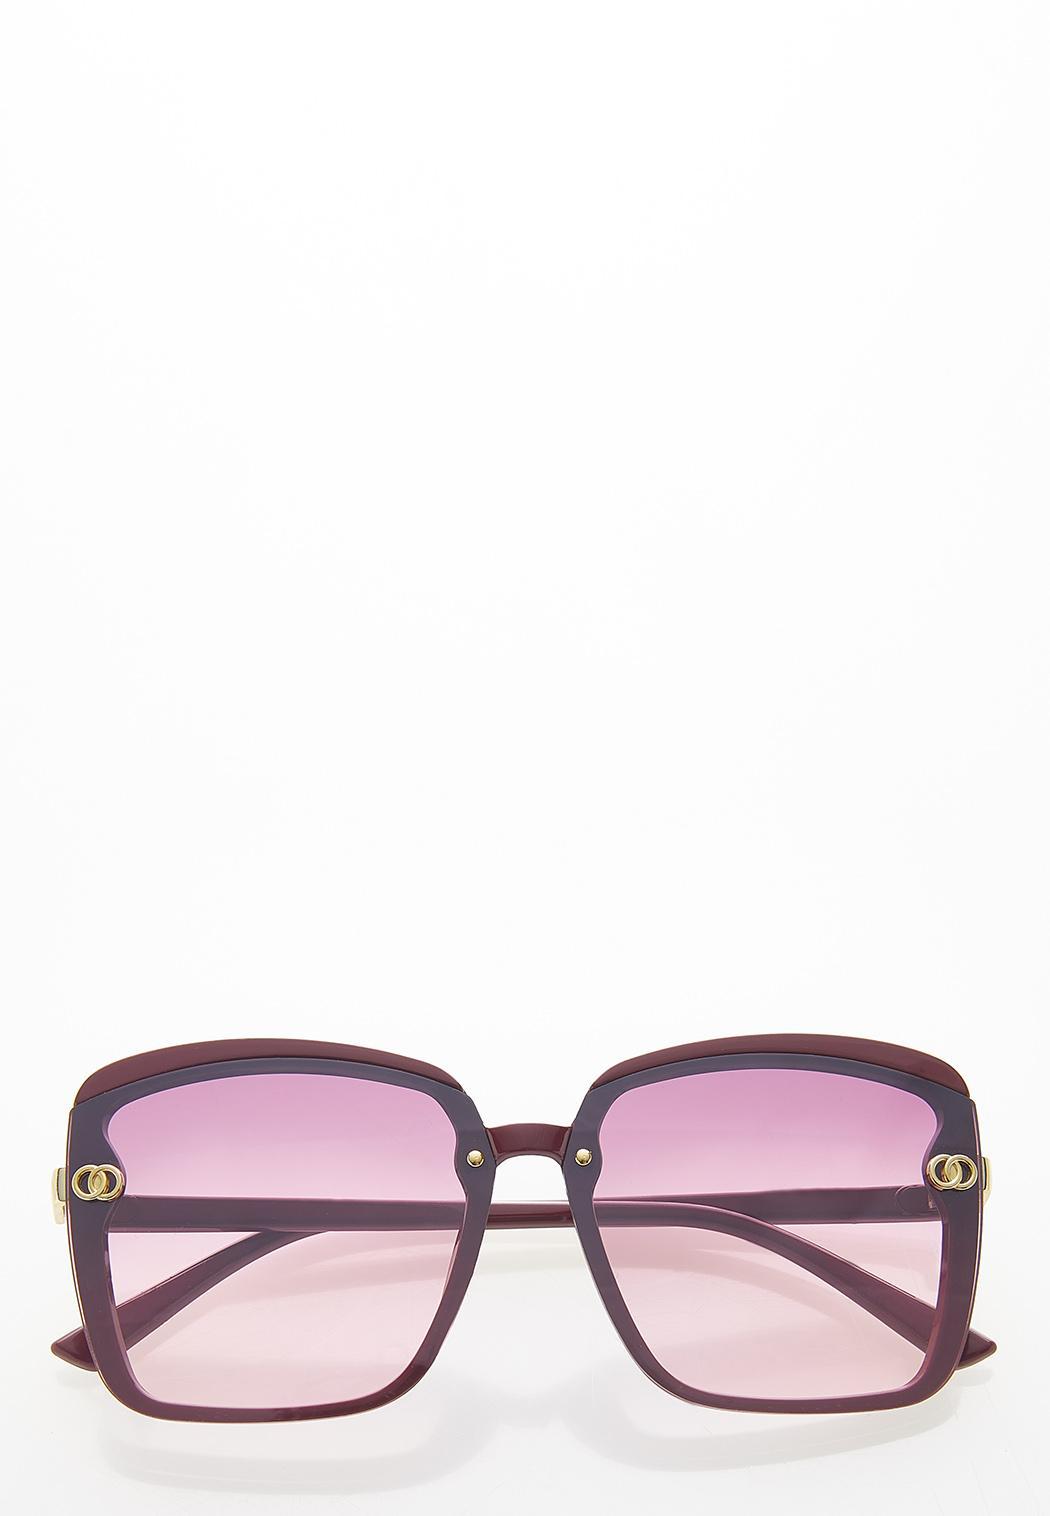 Styling Square Sunglasses